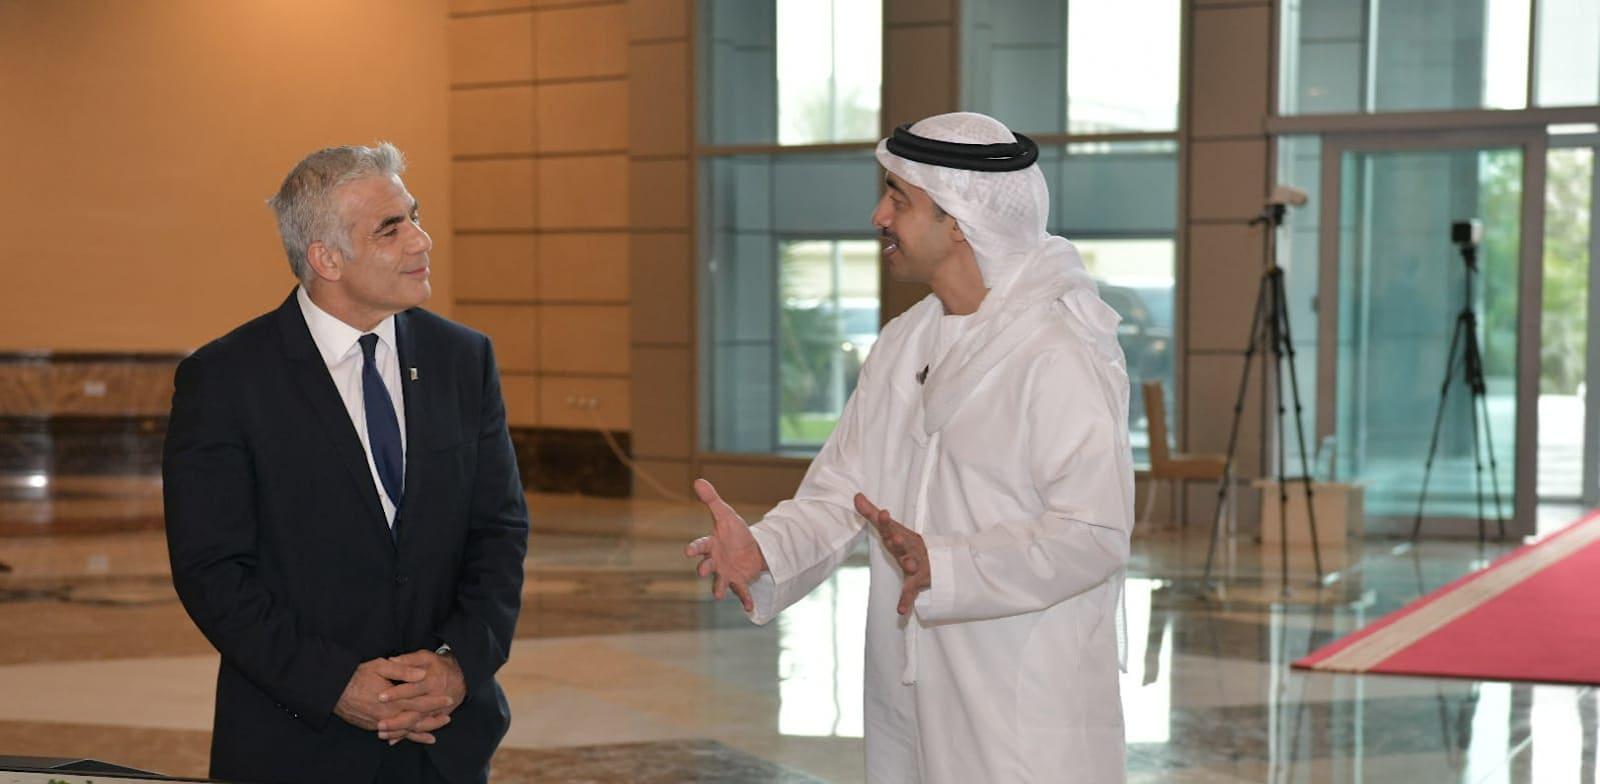 Yair Lapid with UAE Foreign Minister Sheikh Abdullah bin Zayed bin Sultan Al Nahyan  credit: Shlomi Amsalem, GPO